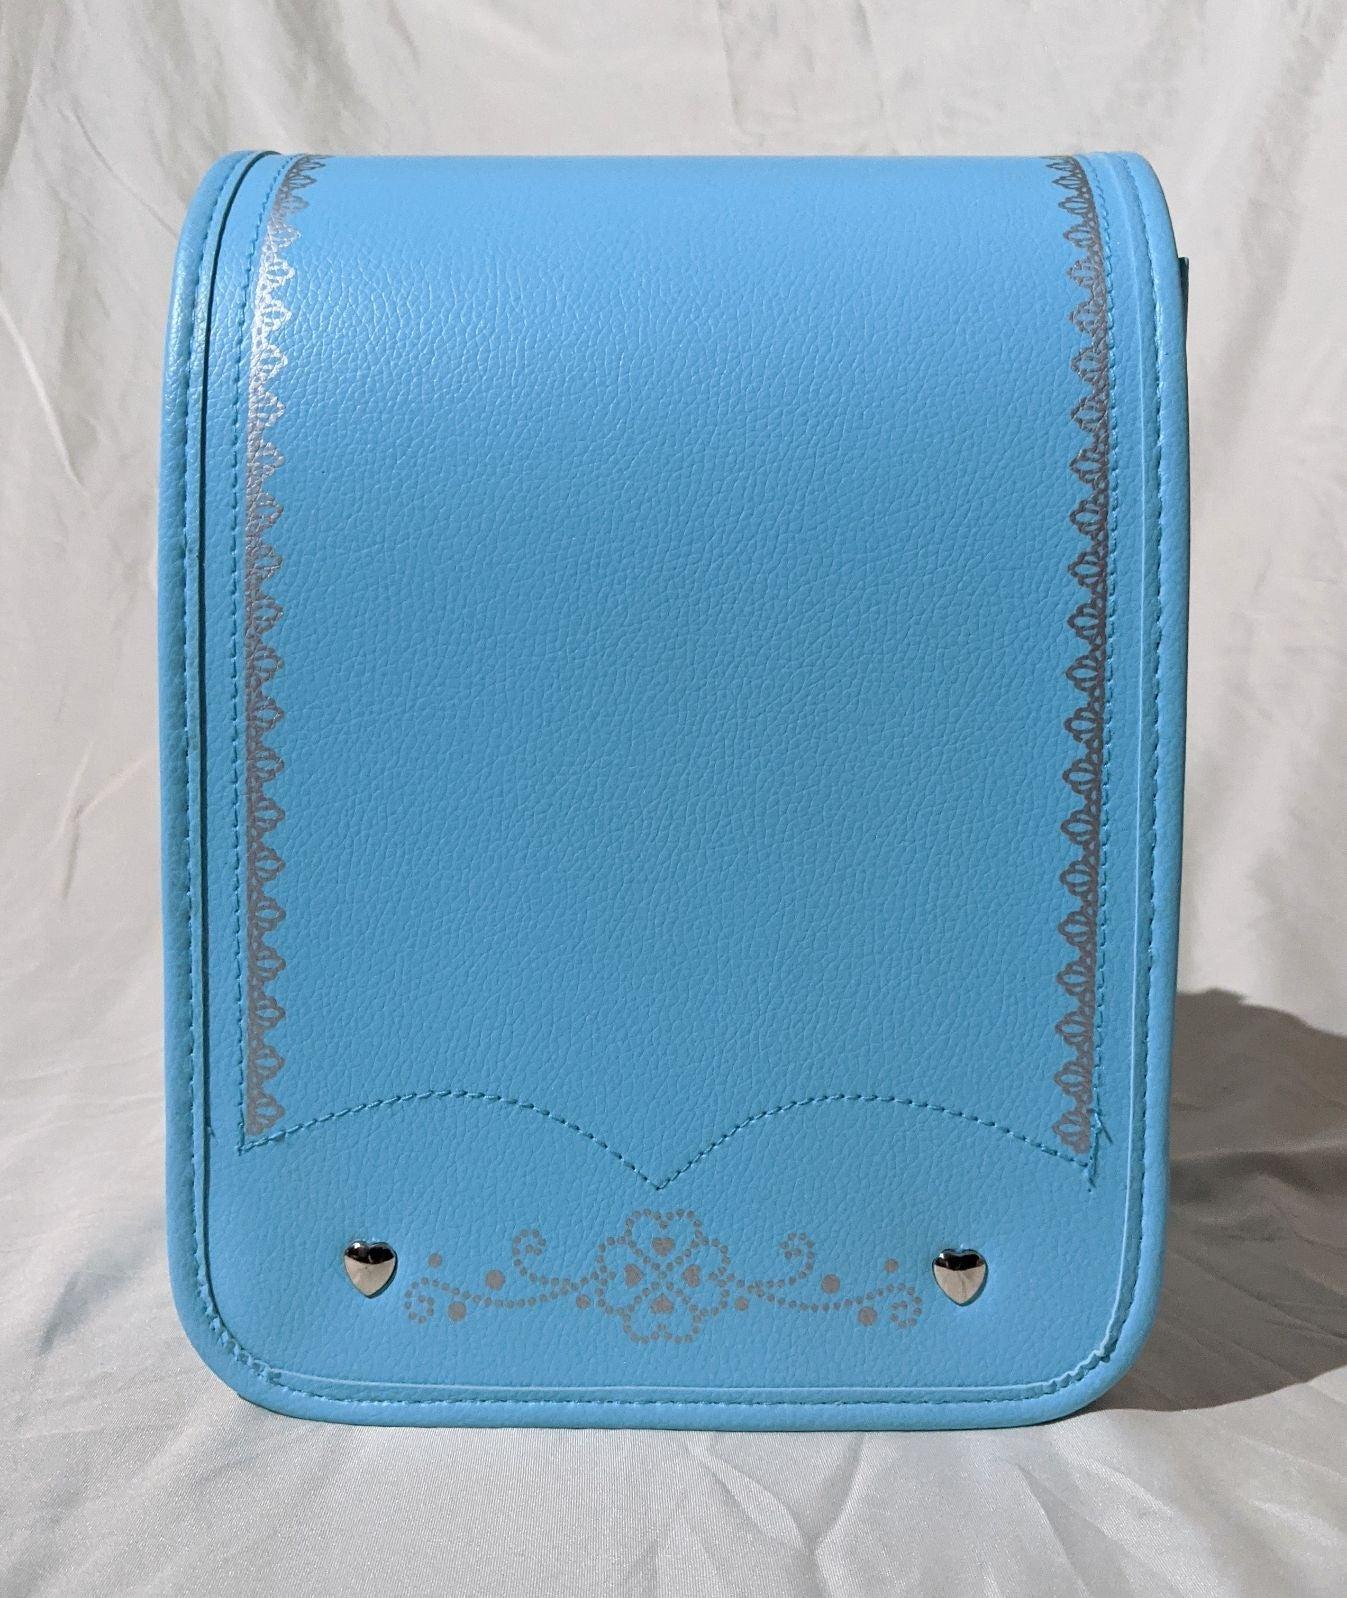 Randoseru Style Children's Backpack